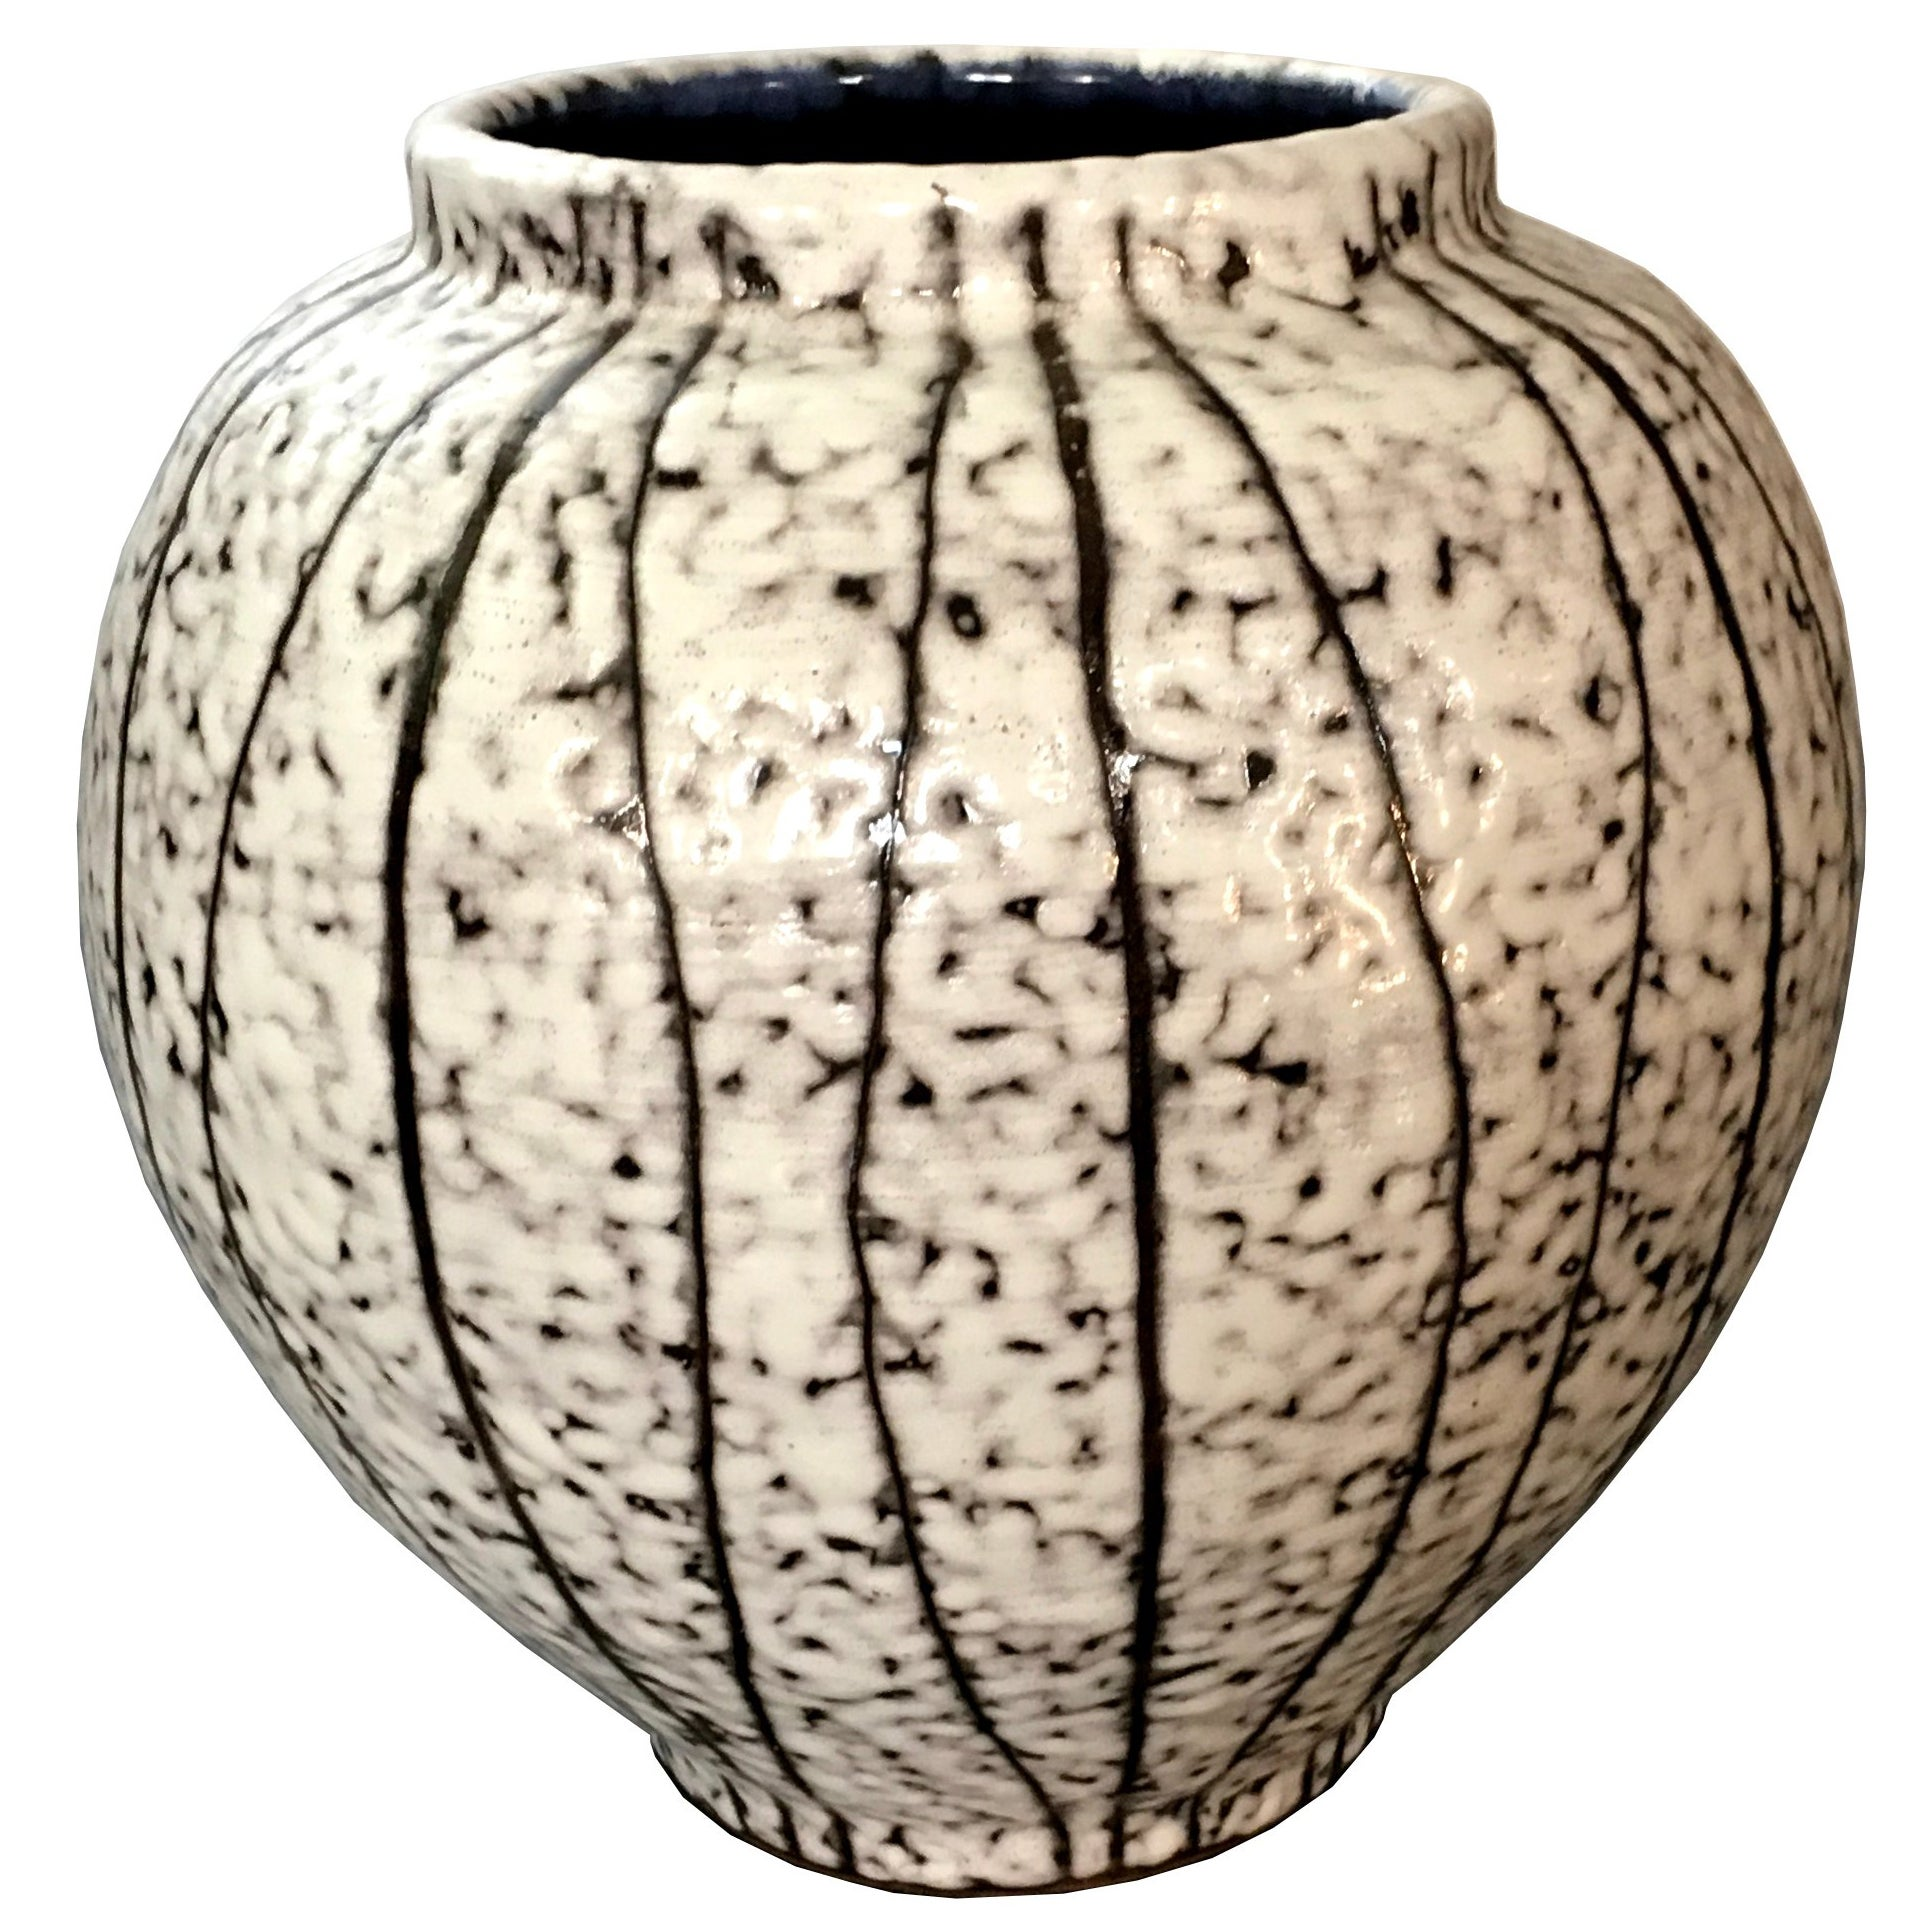 Late 20th Century Black White Glazed Ceramic Vase in Scandinavian Modern Style